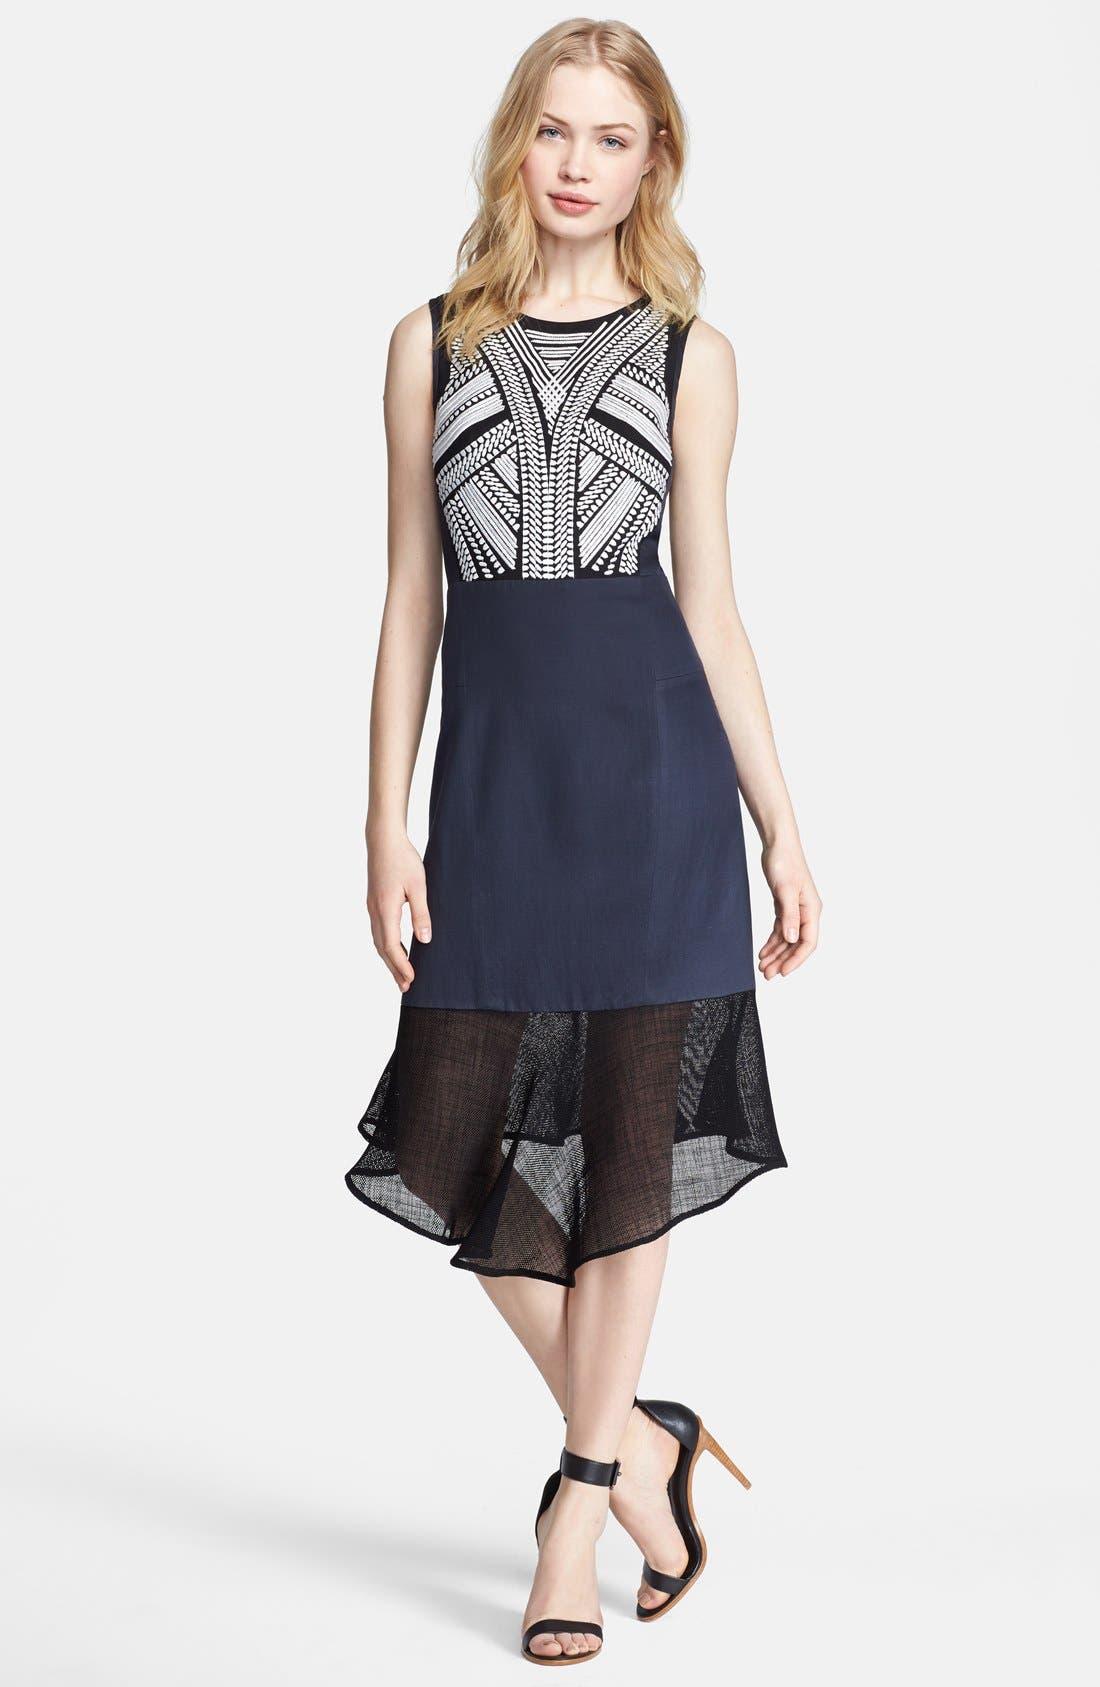 Main Image - Tibi 'Fog' Embroidered A-Line Dress